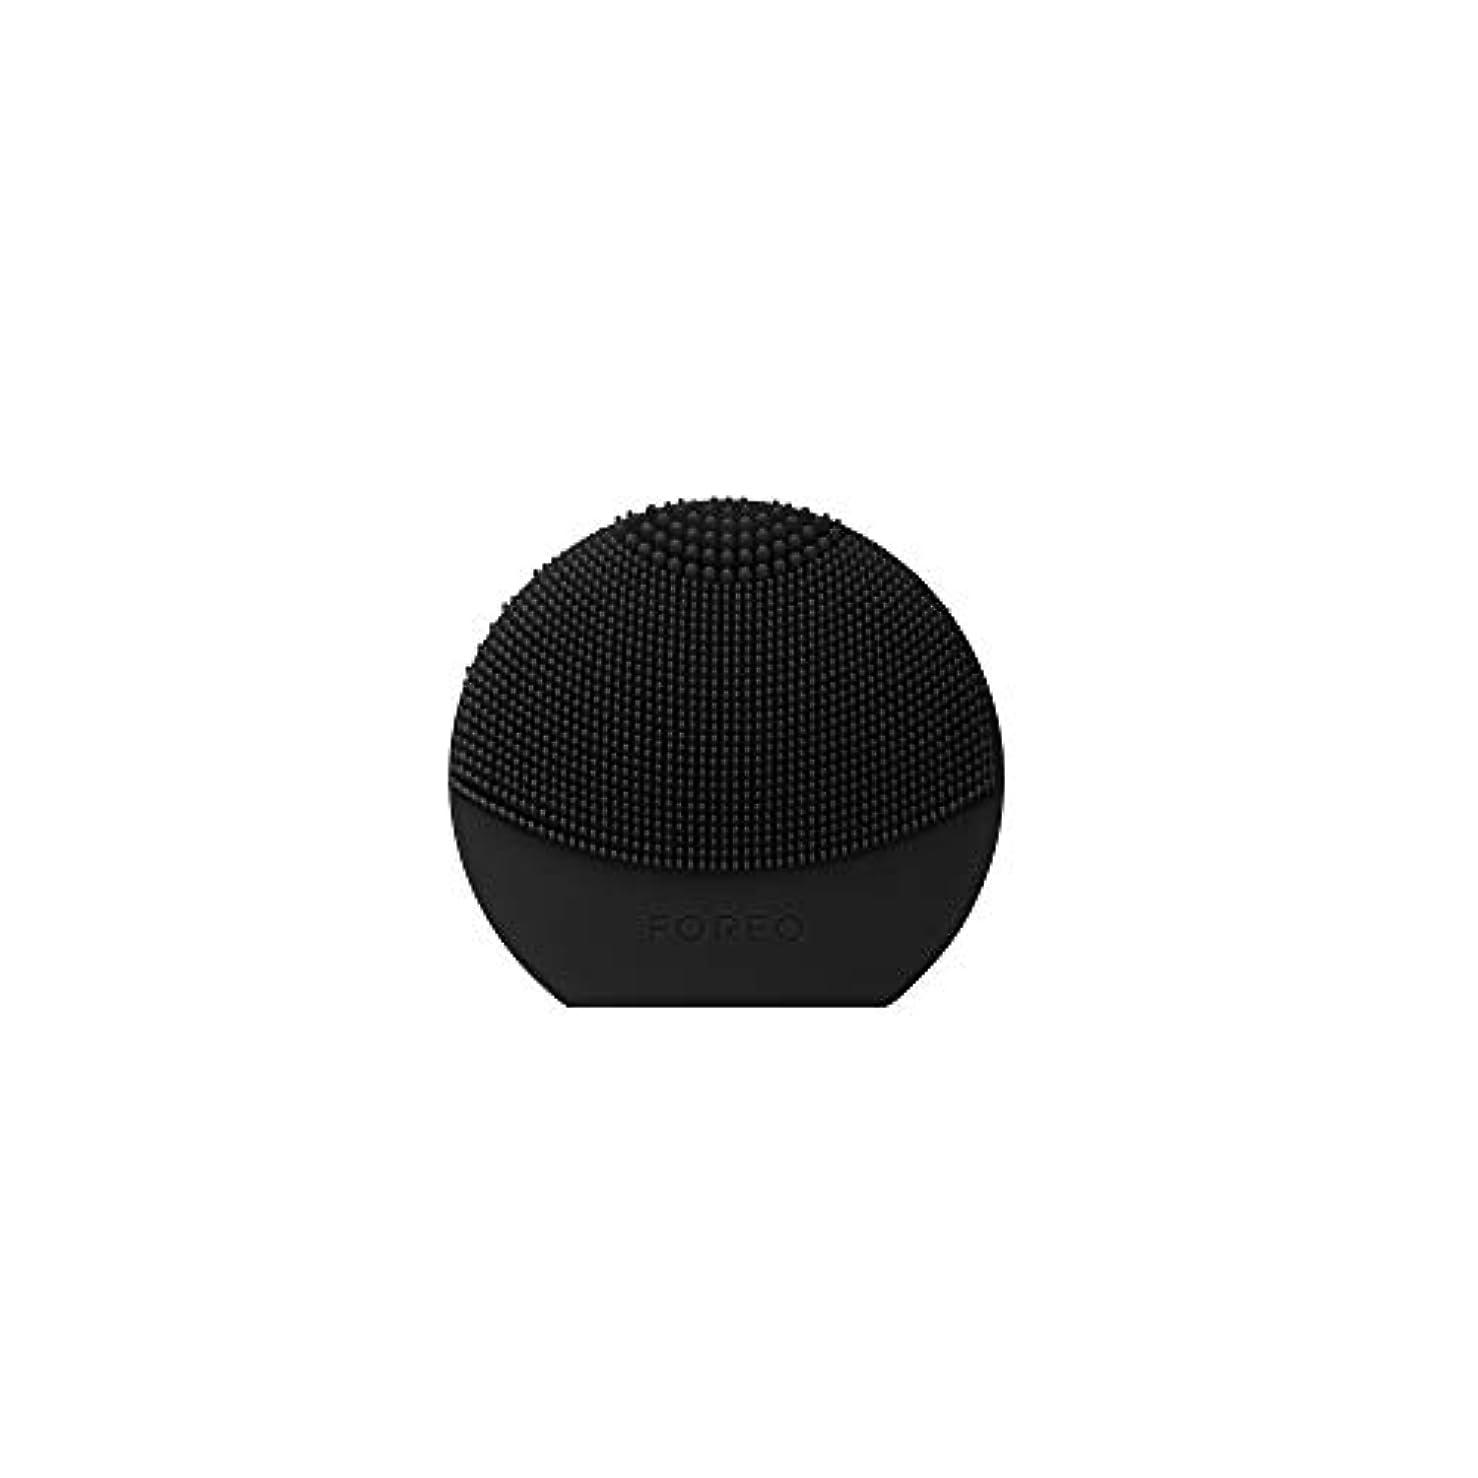 FOREO LUNA Play Plus ミッドナイト シリコーン製 音波振動 電動洗顔ブラシ 電池式